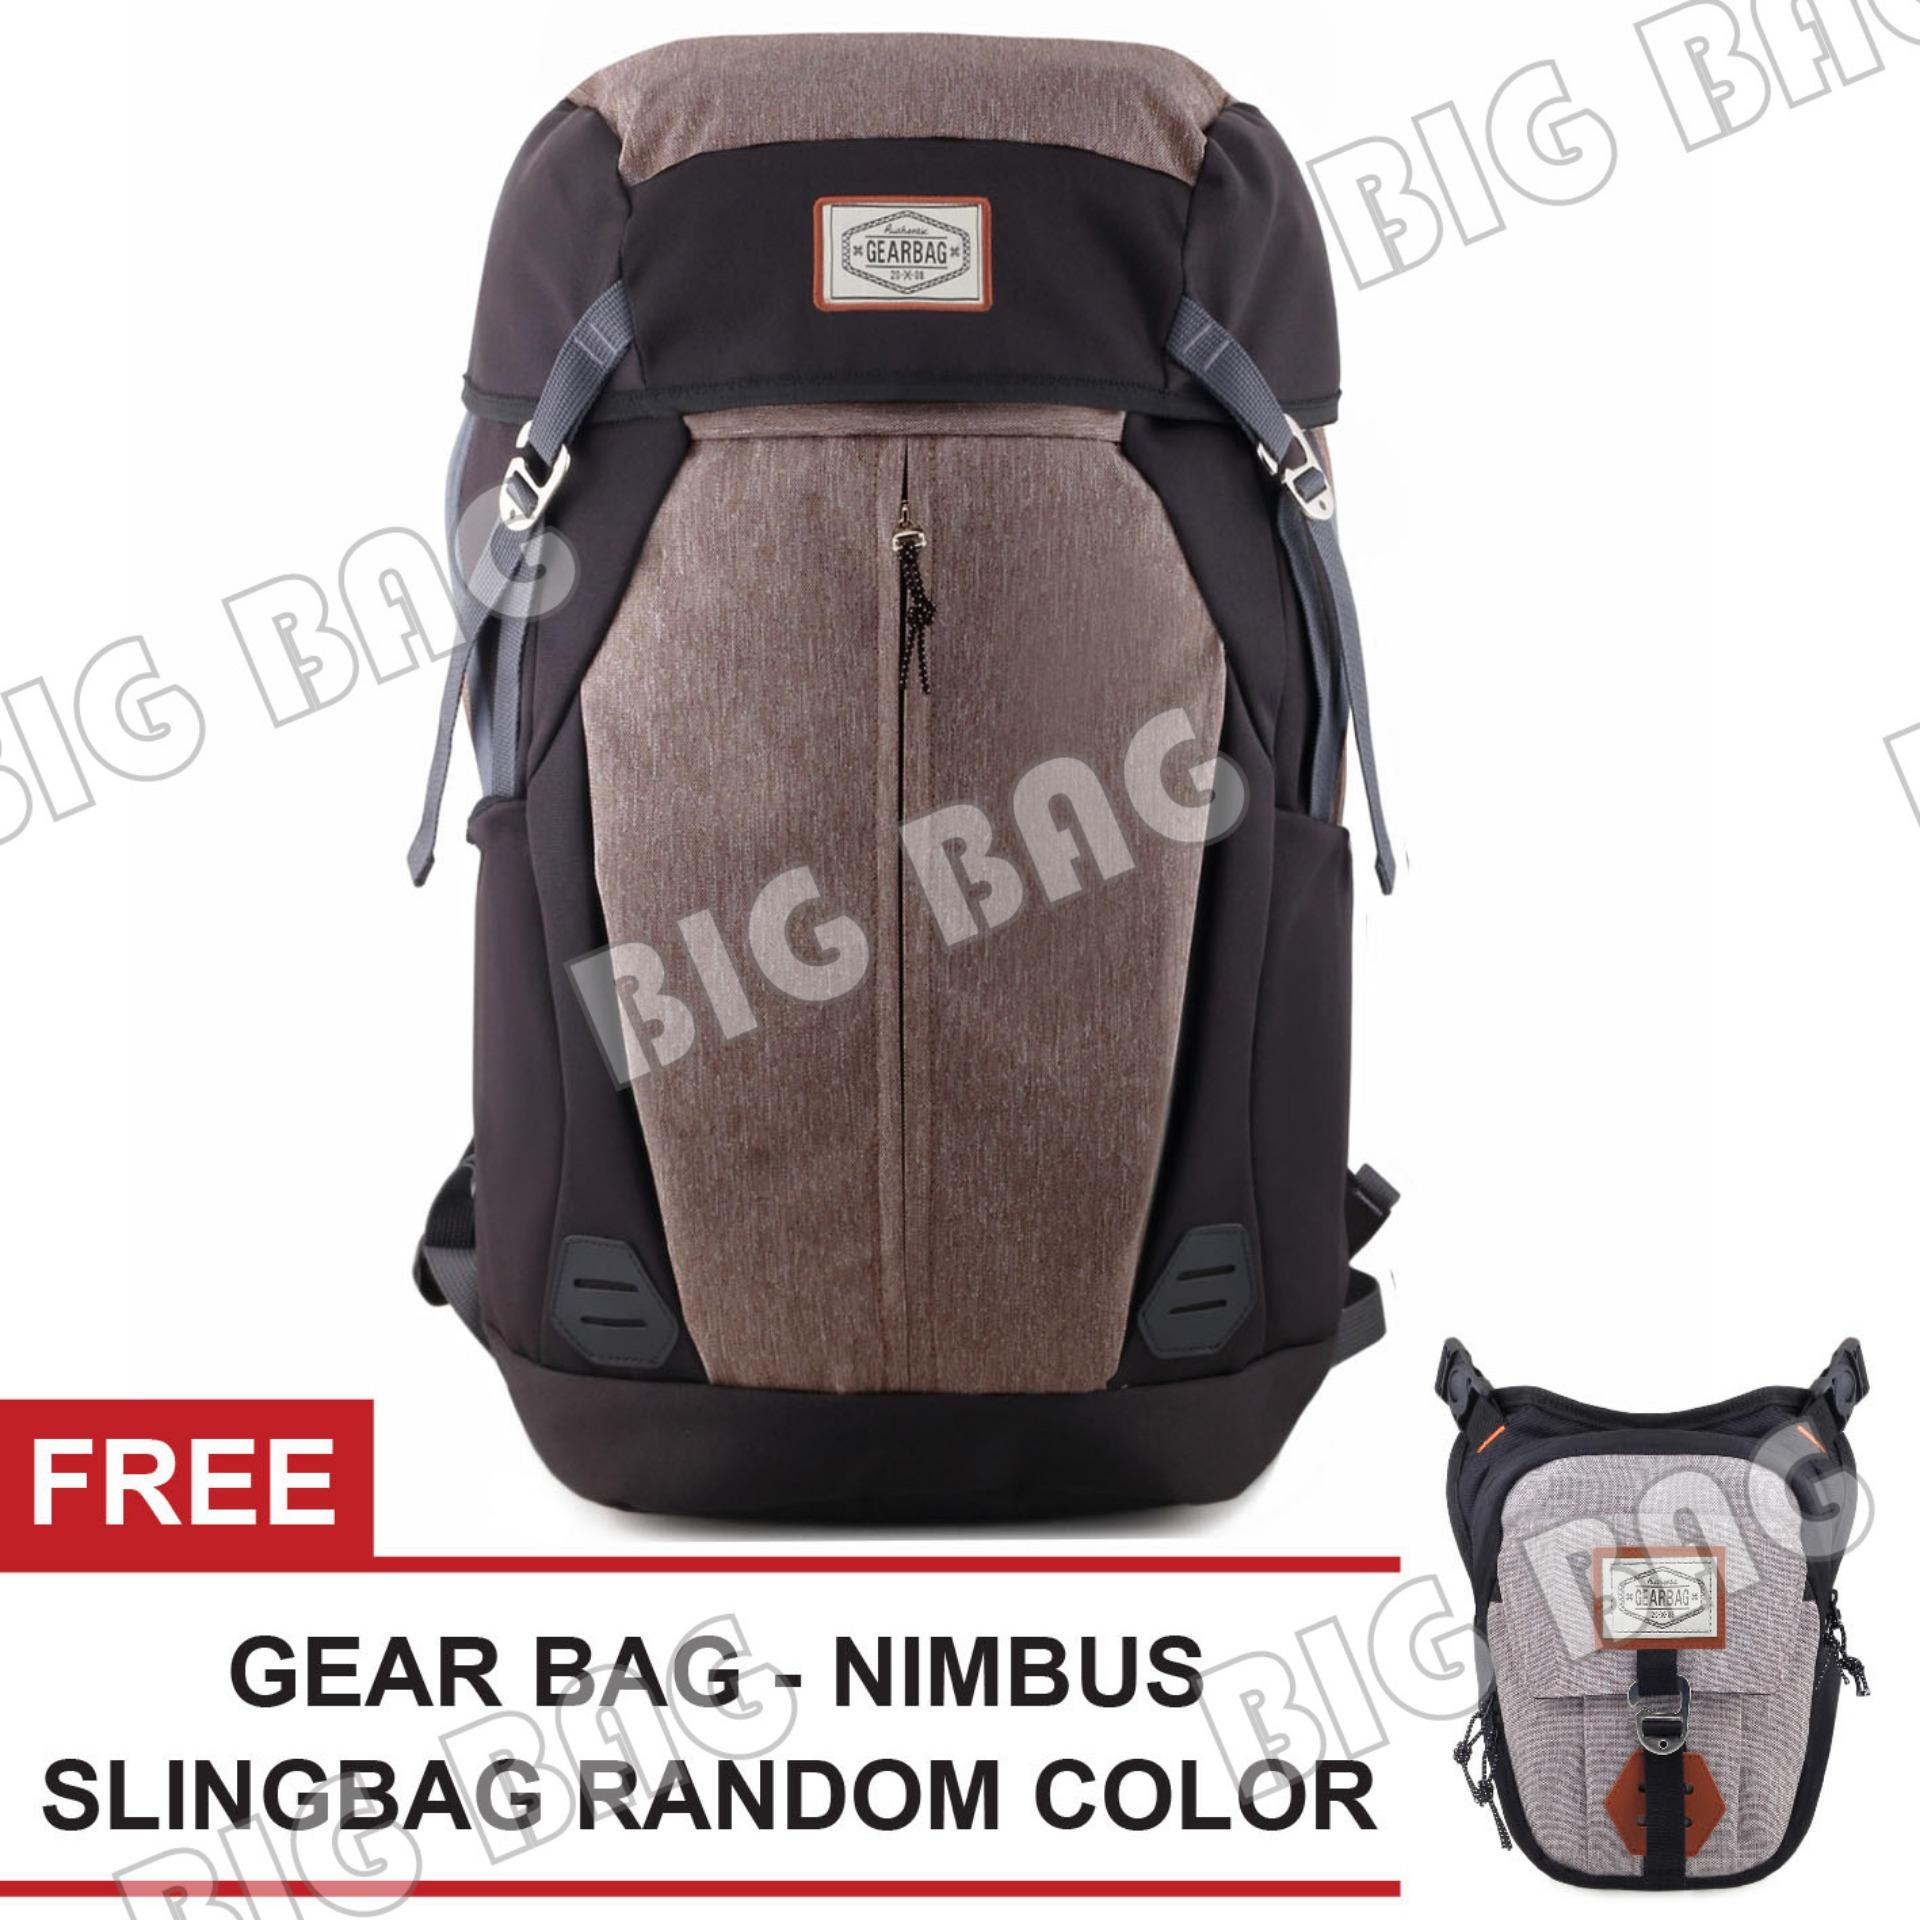 Tas Ransel Gear Bag Daypack Diario Rhino 2.0 Outdoor Tas Laptop Backpack + FREE Tas Selempang